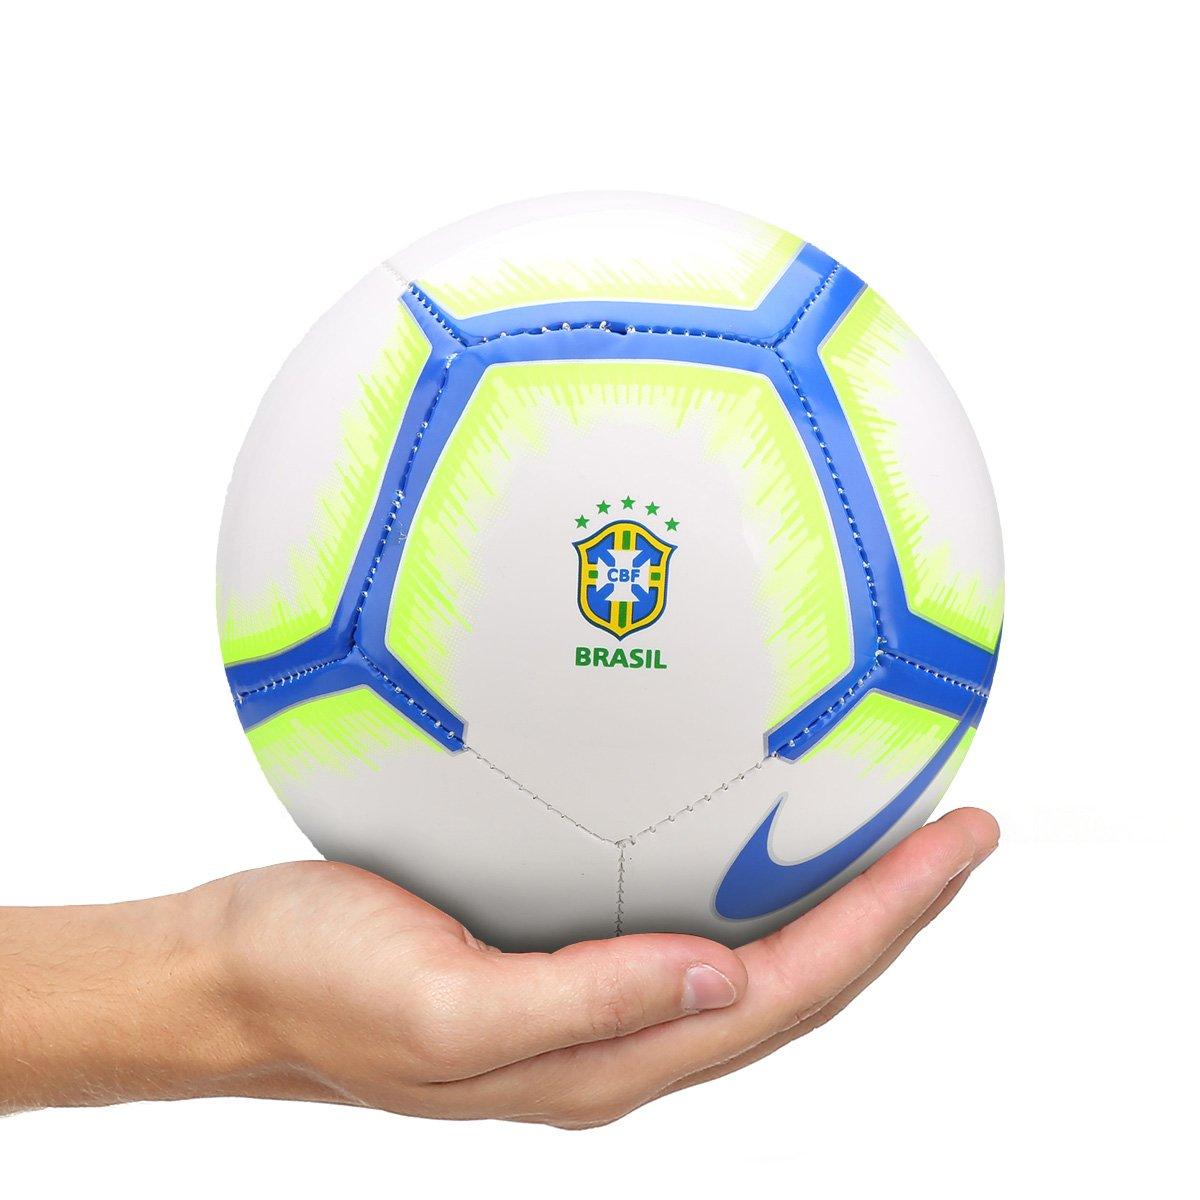 cacd97a2d6001 Mini Bola Futebol Brasil CBF Nike